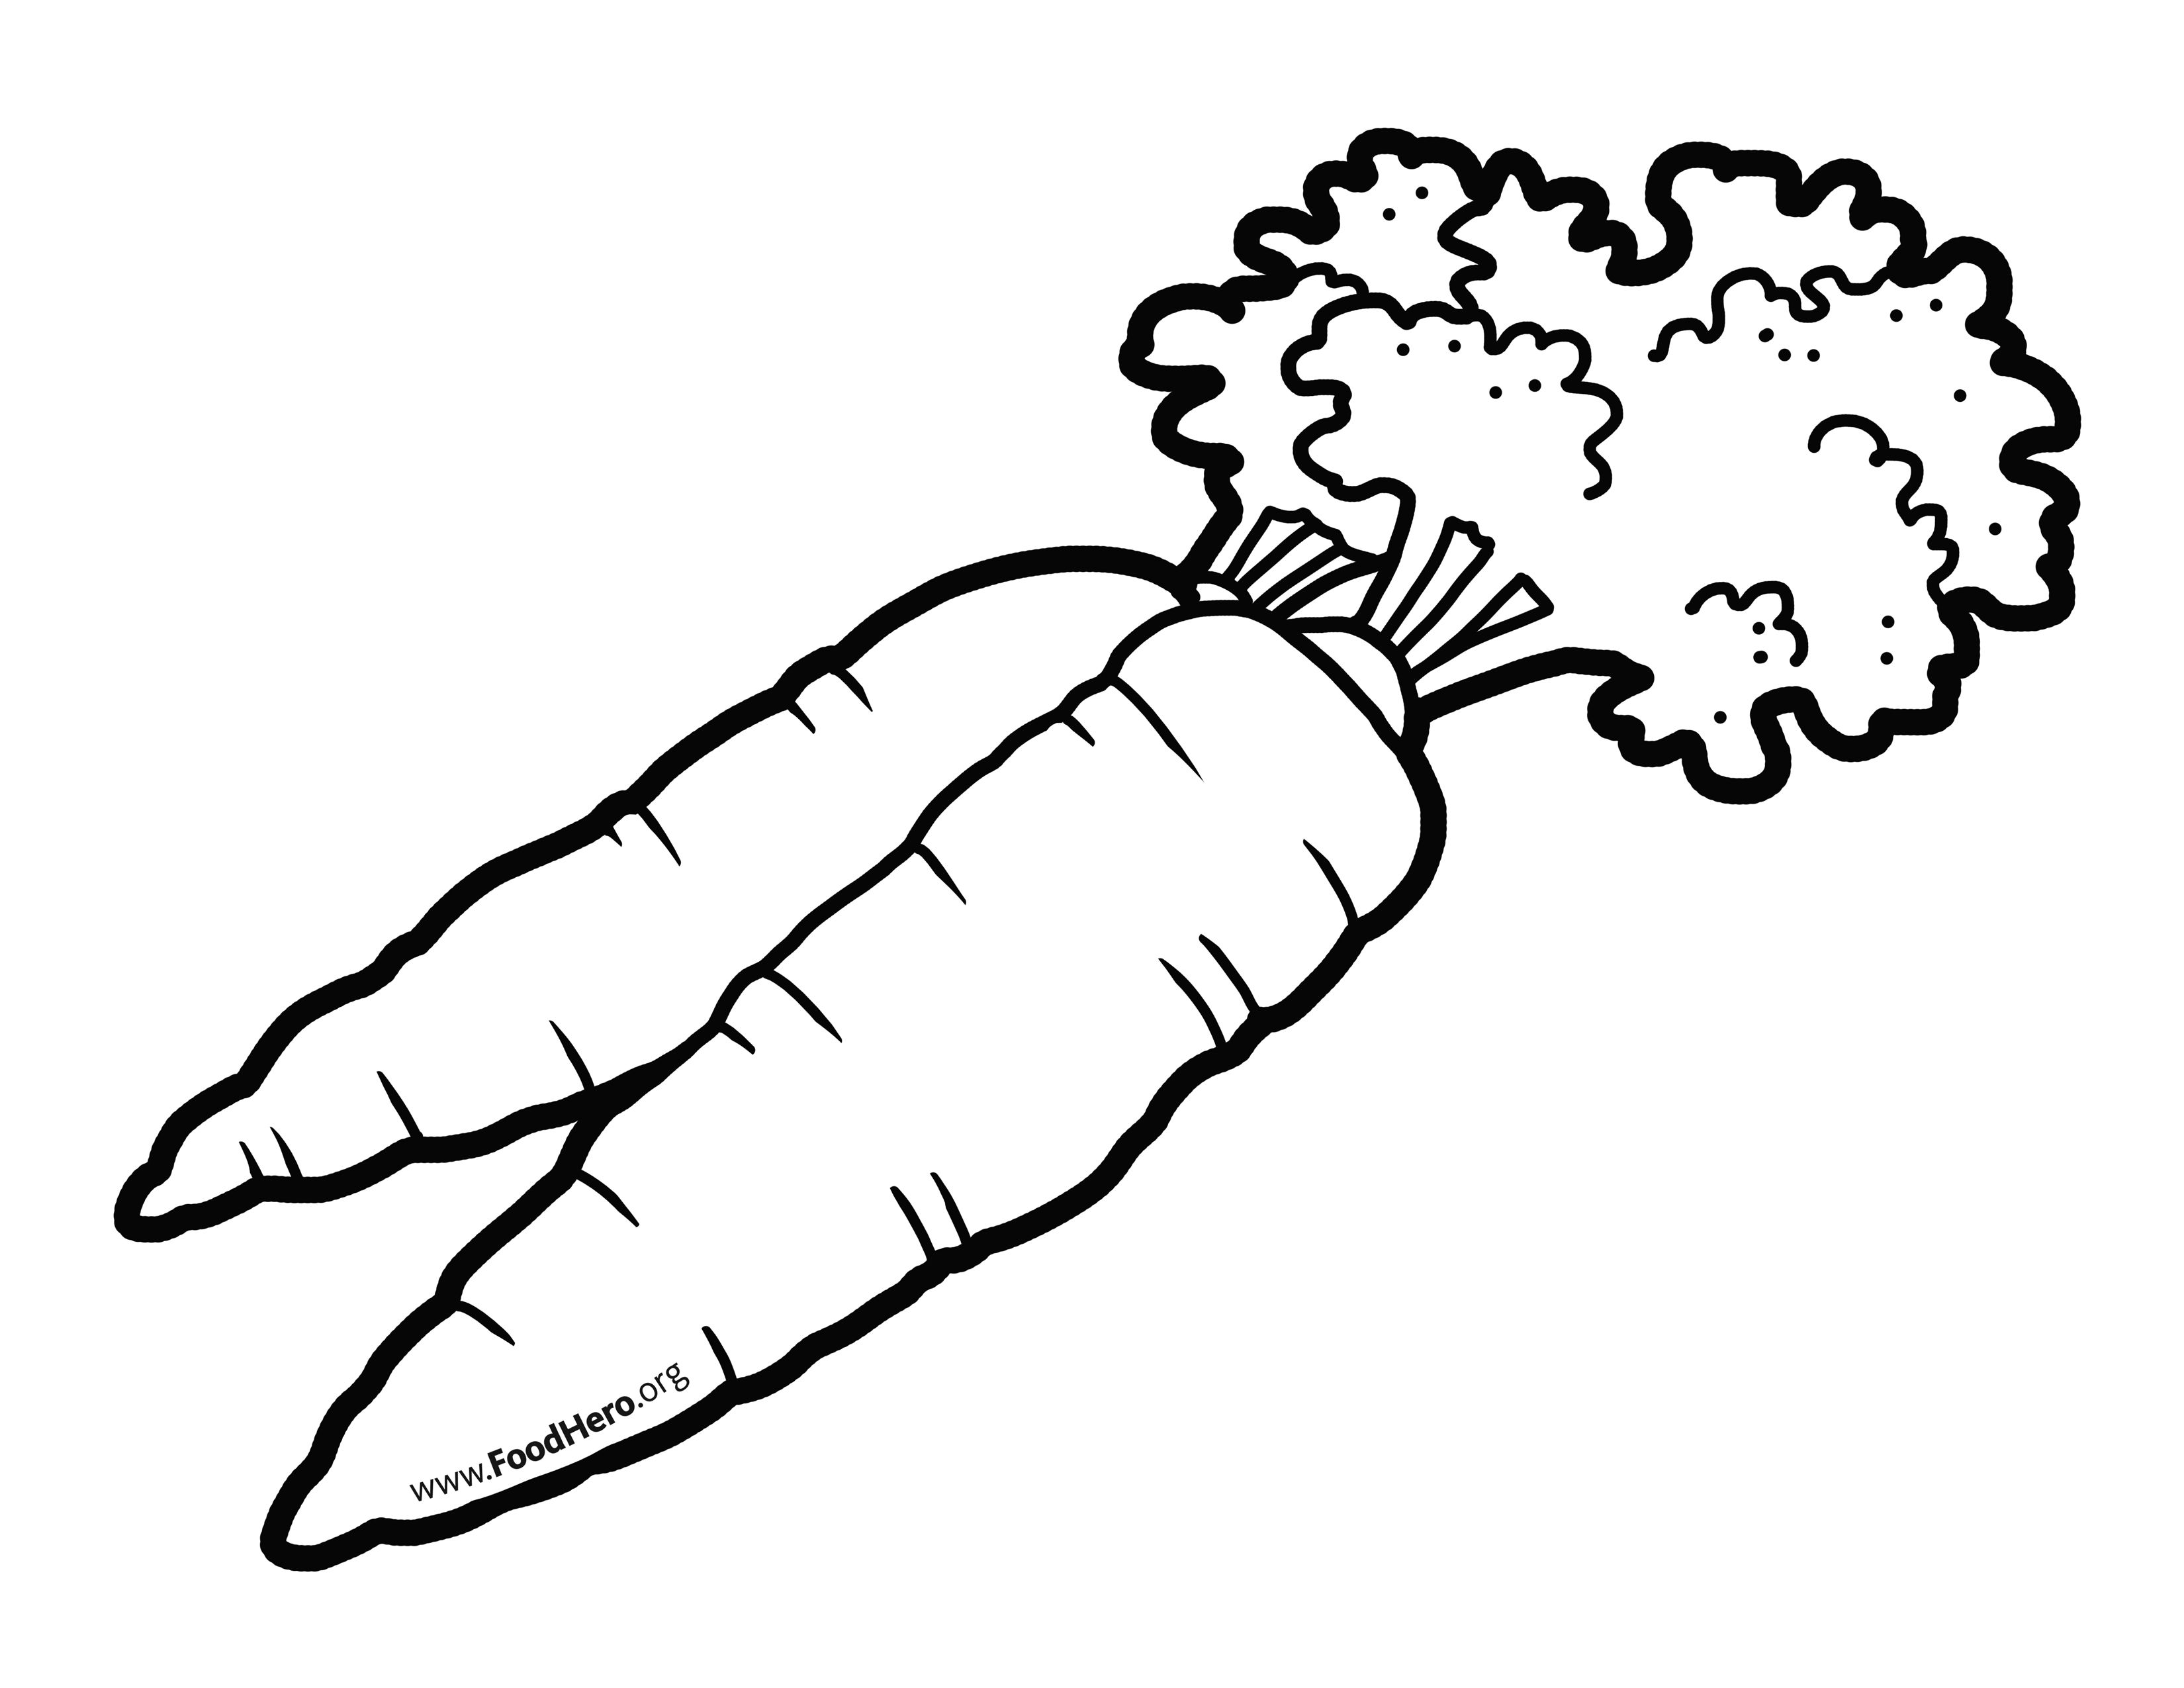 Carrots School Illustration Carrots Foodhero Blackline